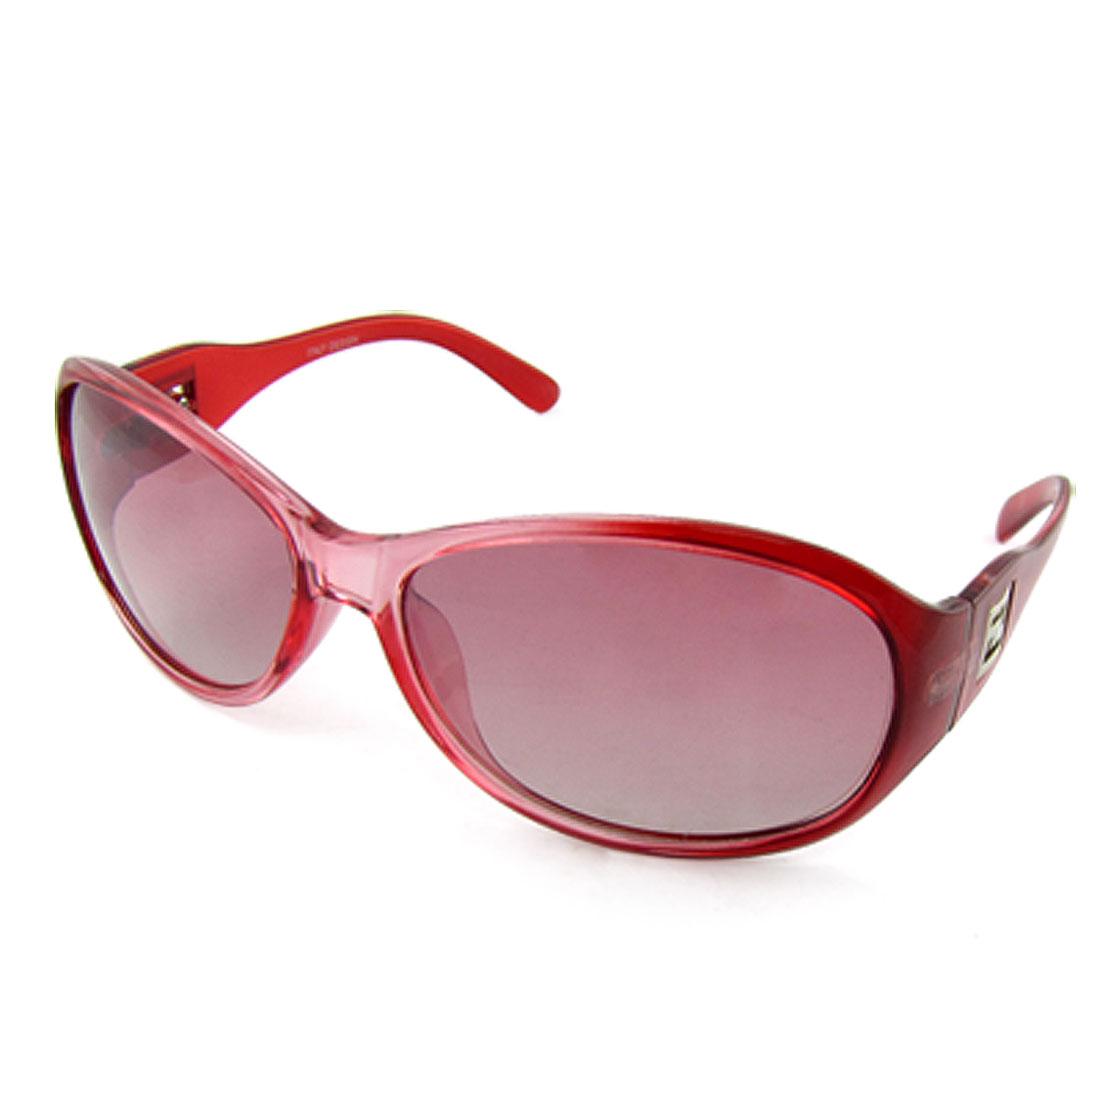 Lady Hard Plastic Clear Red Full Rim Frame Sunglasses